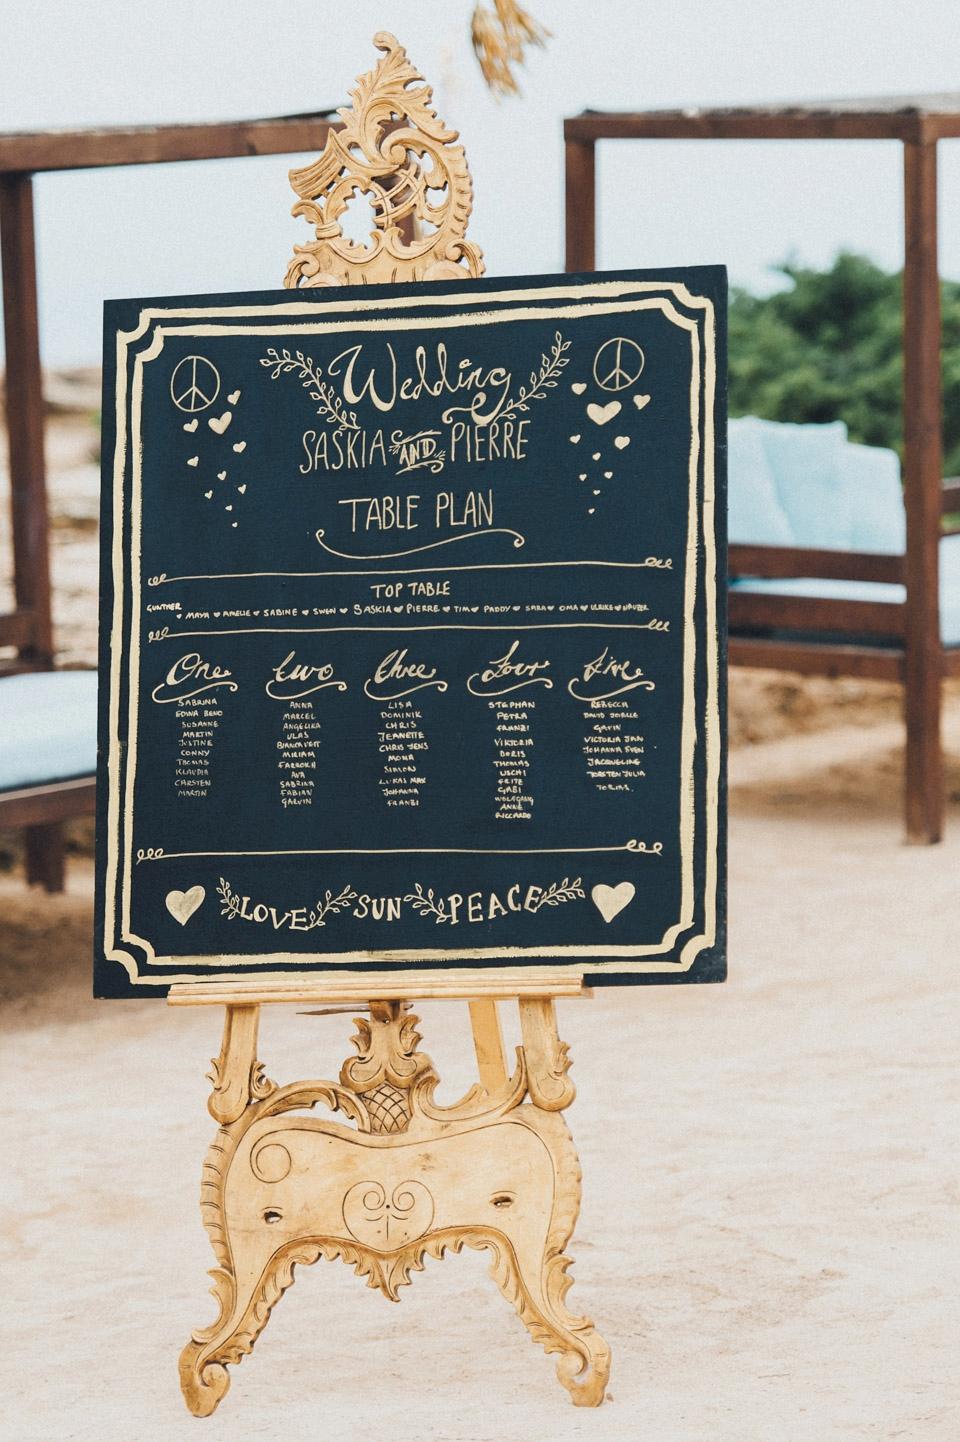 bohemian-ibiza-kreativ-wedding_0068 hochzeitsfotograf hochzeitsvideo ibiza bohemian weddingSaskia & Pierre Bohemian Bohemian Ibiza Weddingbohemian ibiza kreativ wedding 0068